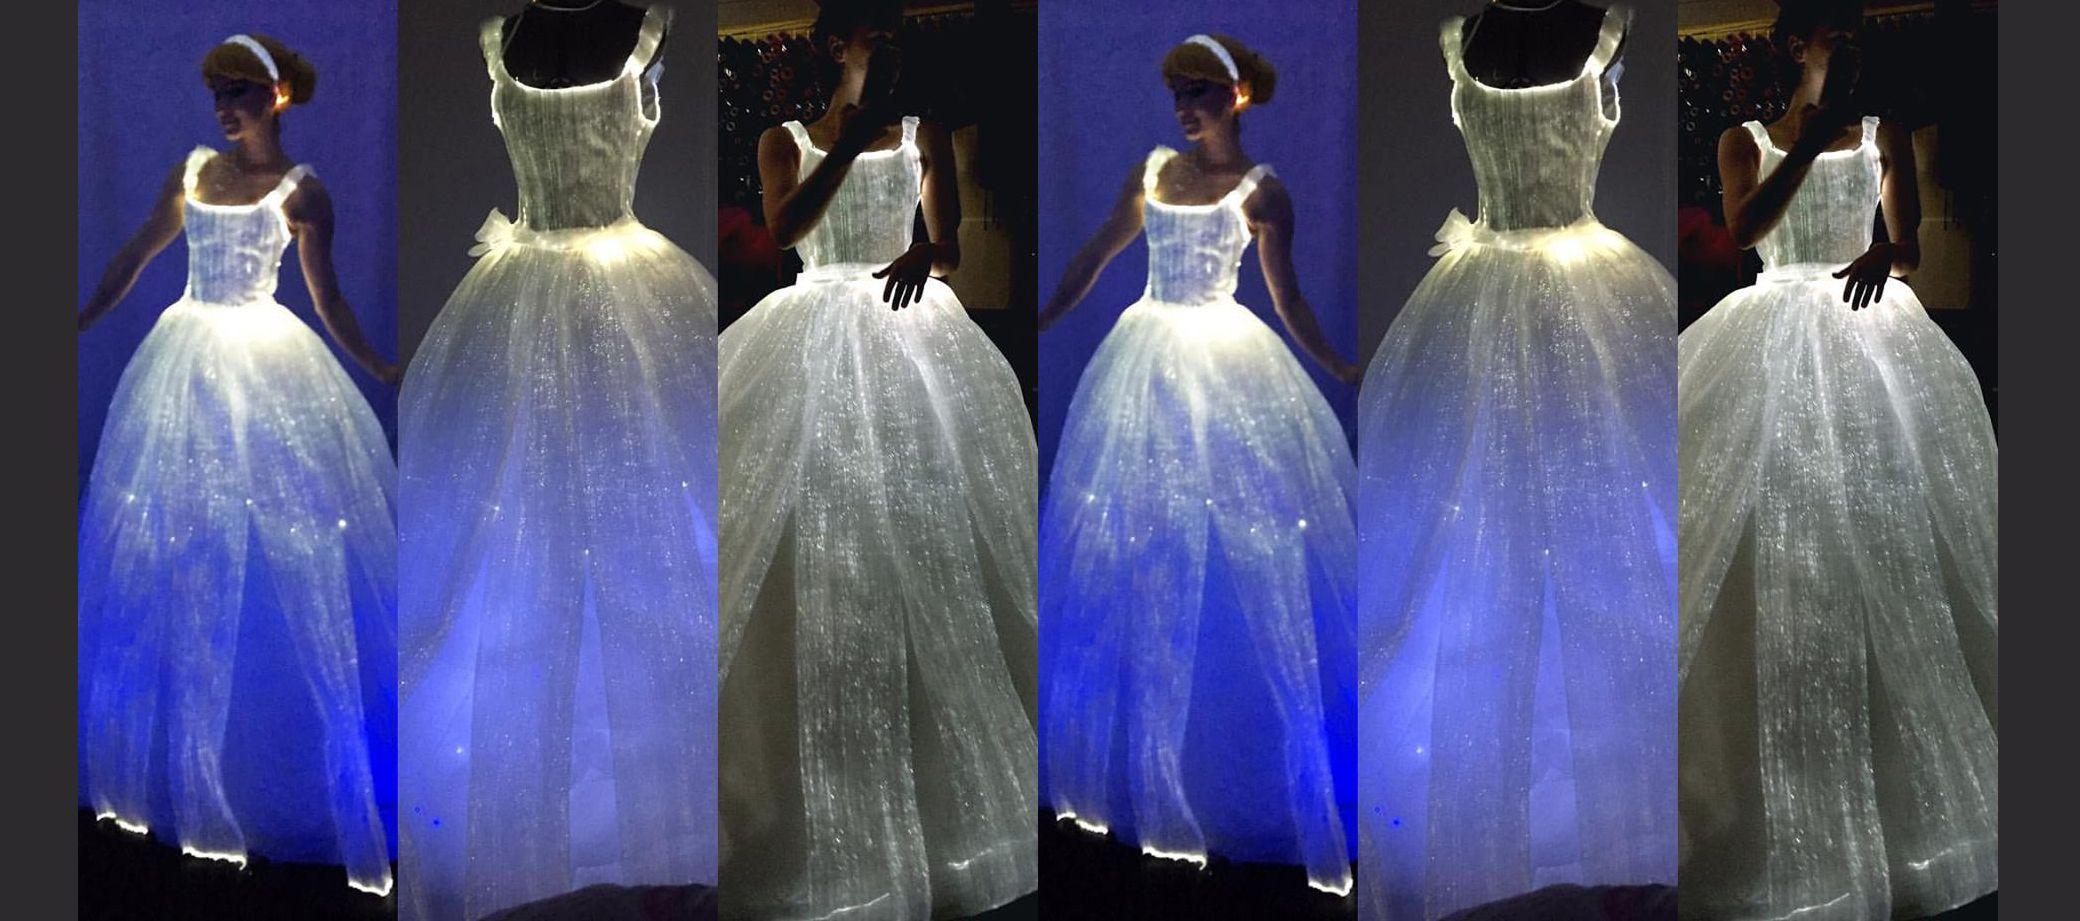 Light up wedding dress  I Made This Couture Light Up Wedding Dress In Less Than A Week